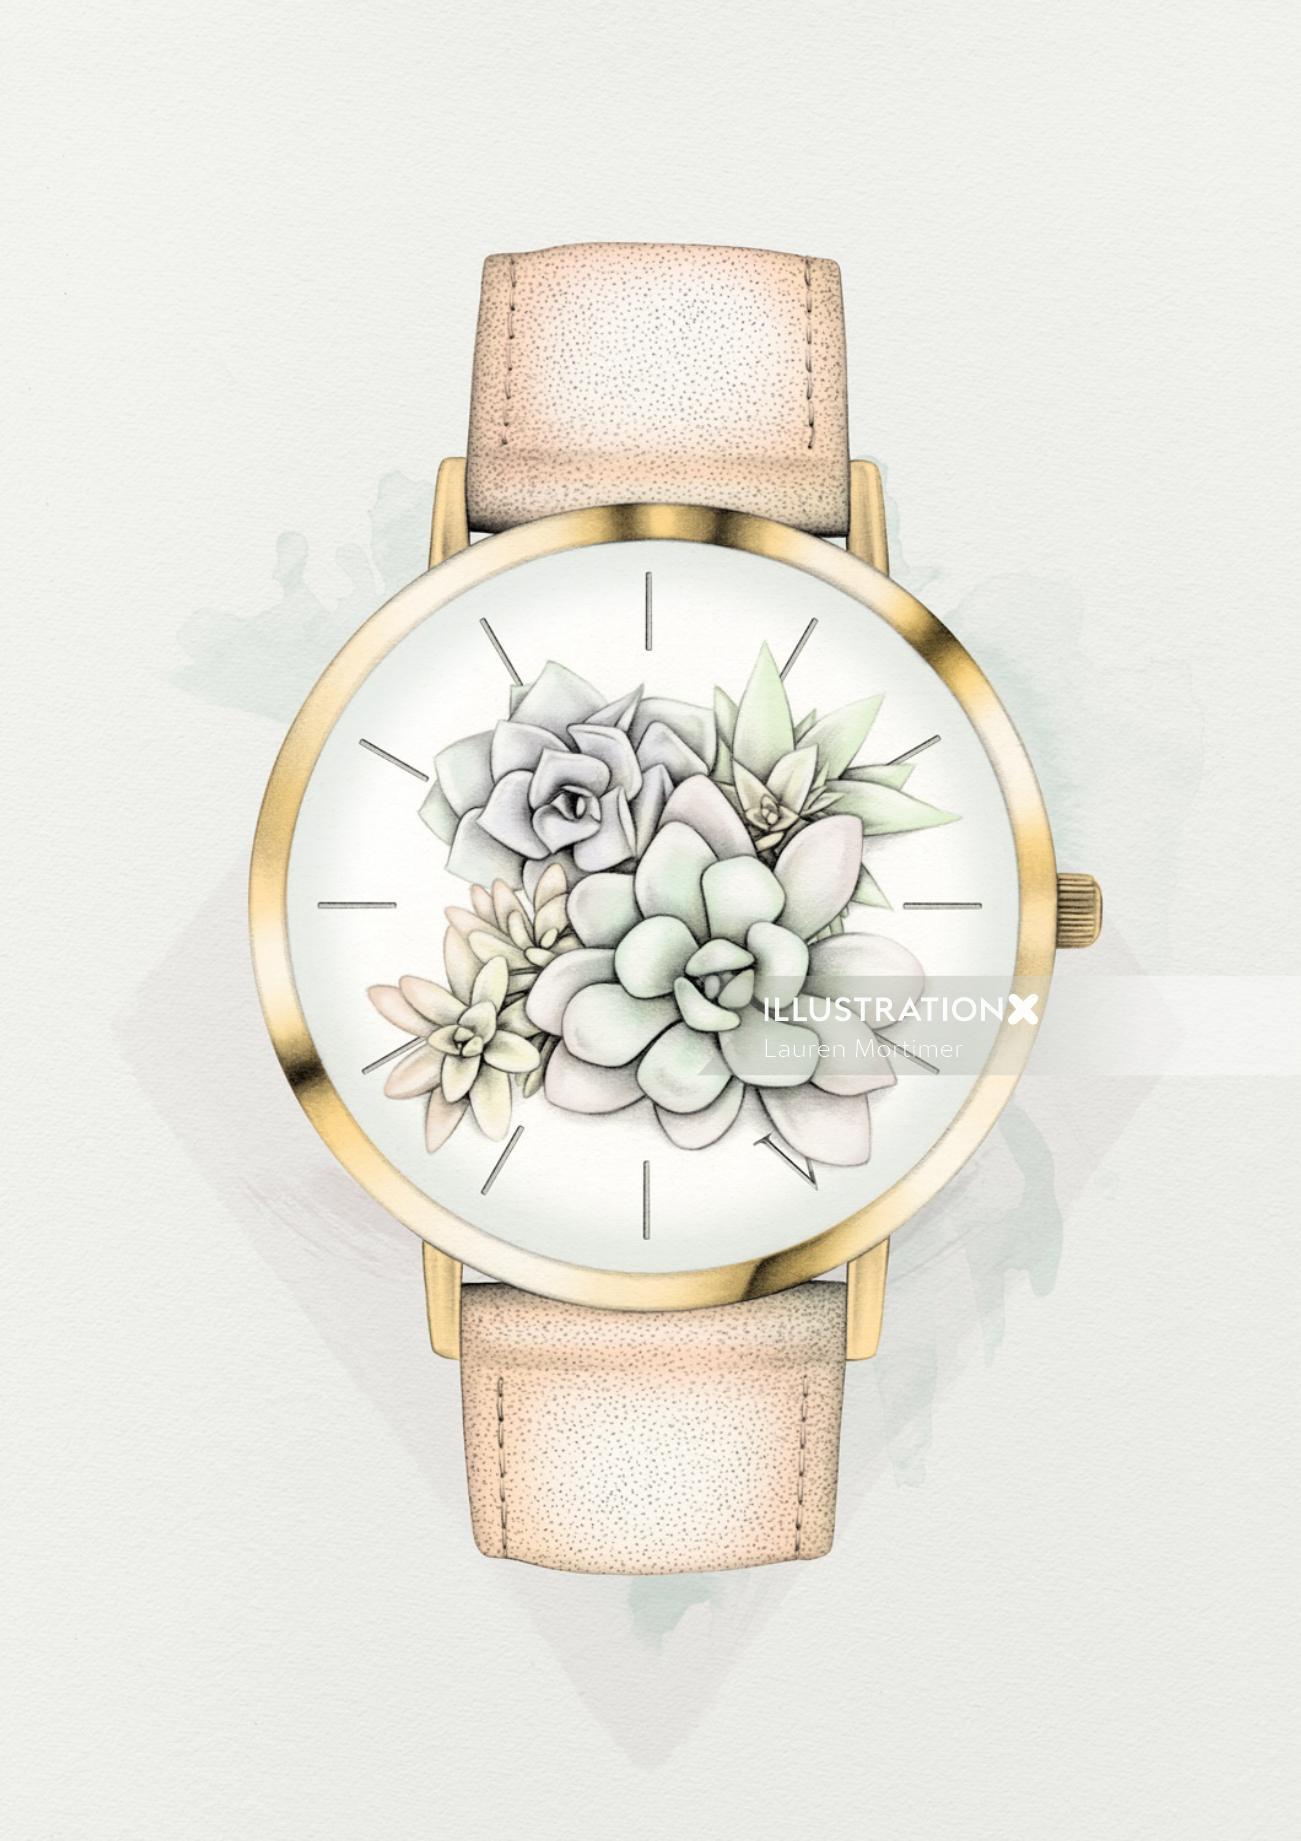 Floral watch watercolor illustration by Lauren Mortimer